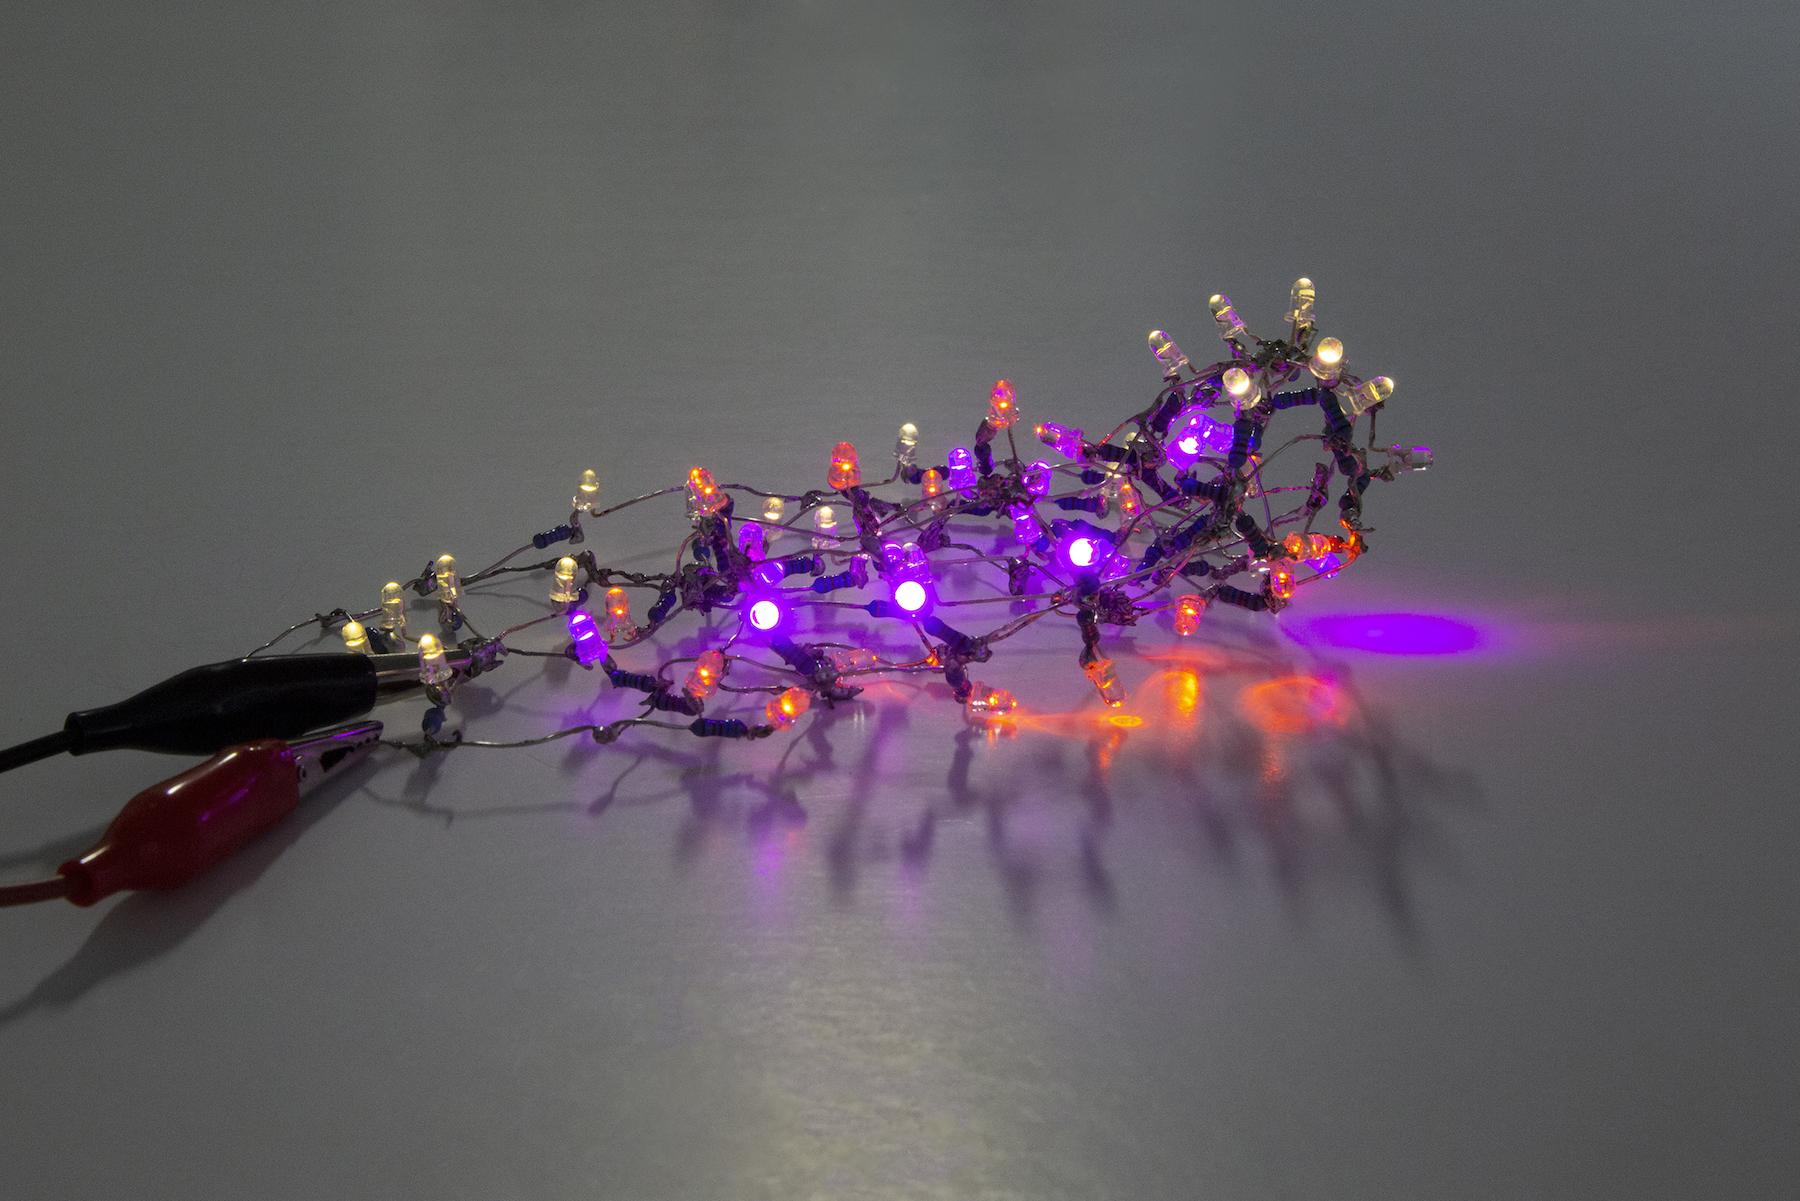 Salmanson_LighterThanAir15-View1_LED+wire_5.6x3.6x1.7_2018.jpg